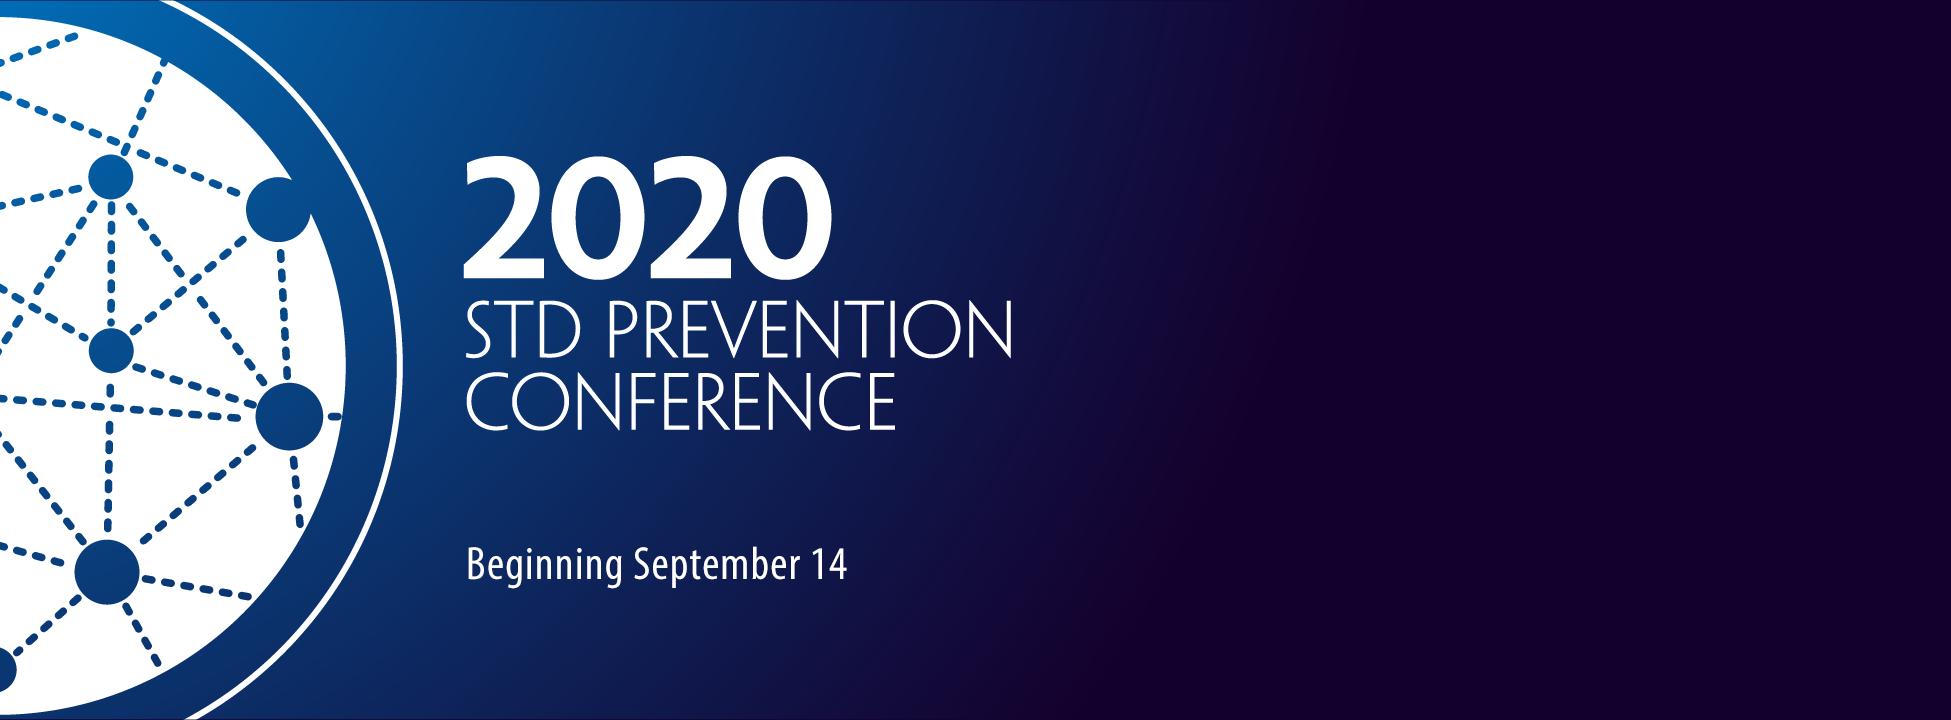 2020 STD Prevention Conference